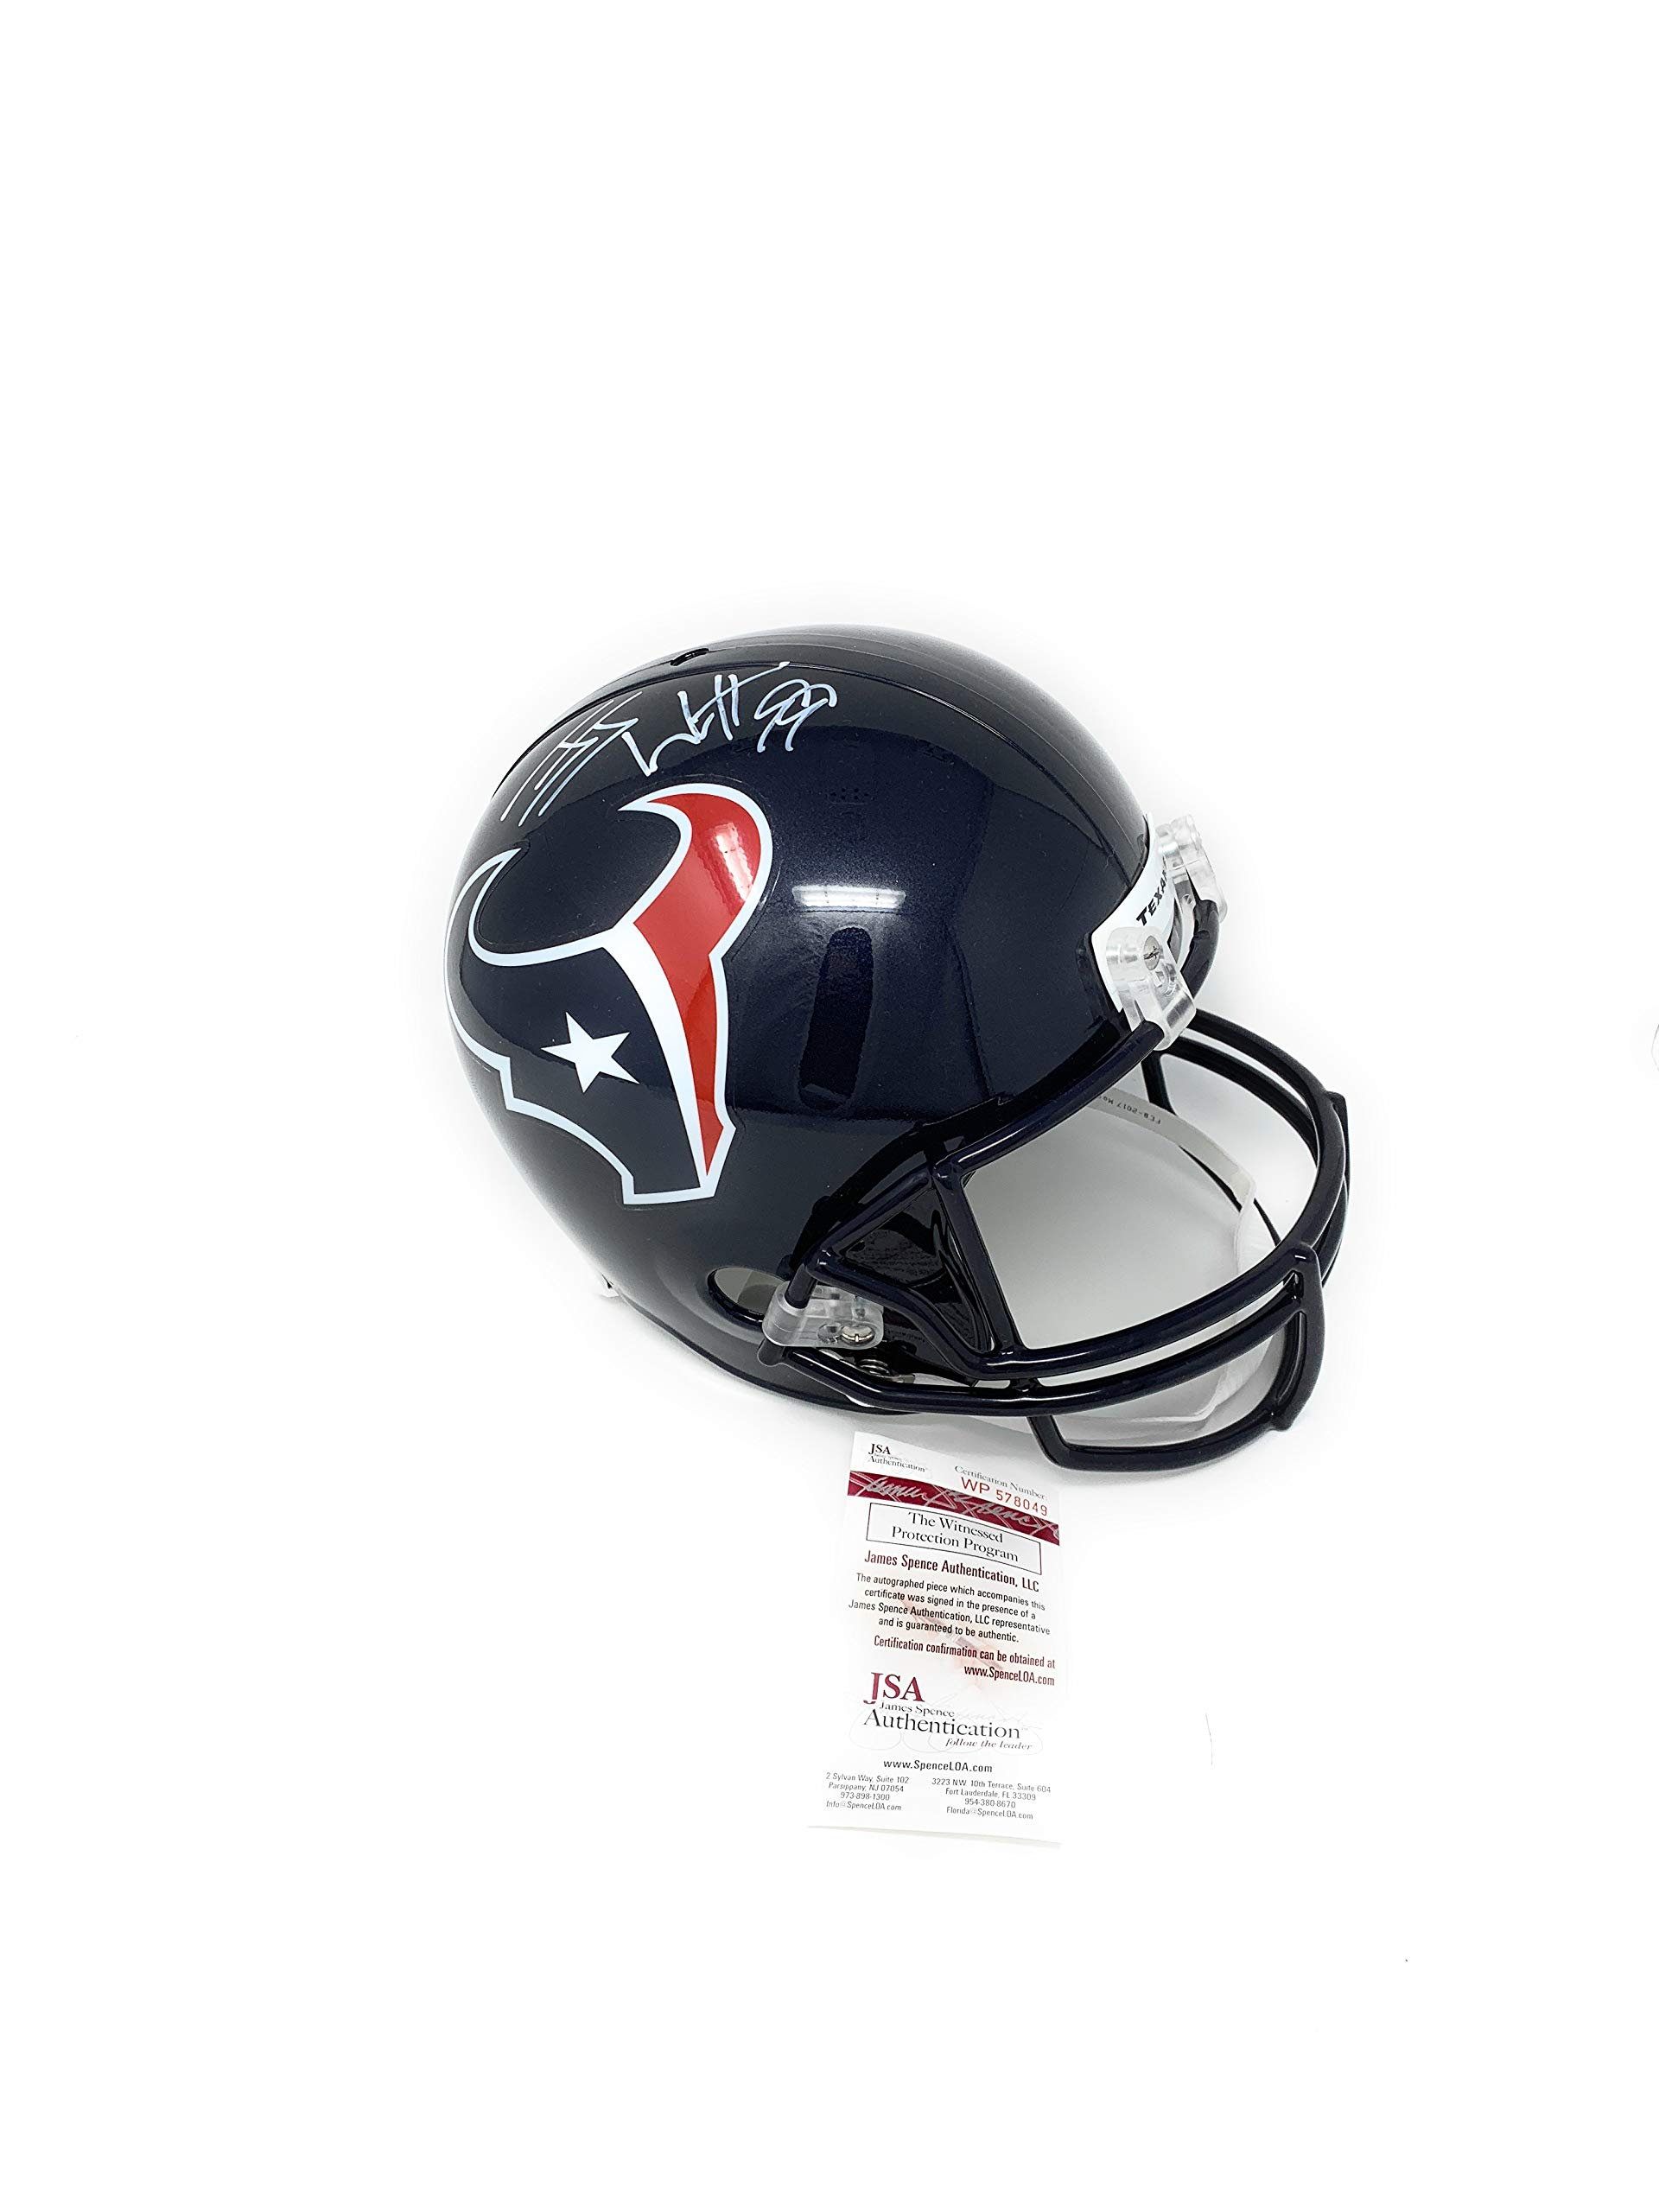 JJ Watt Houston Texans Signed Autograph Full Size Helmet Watt Hologram JSA Witnessed Certified